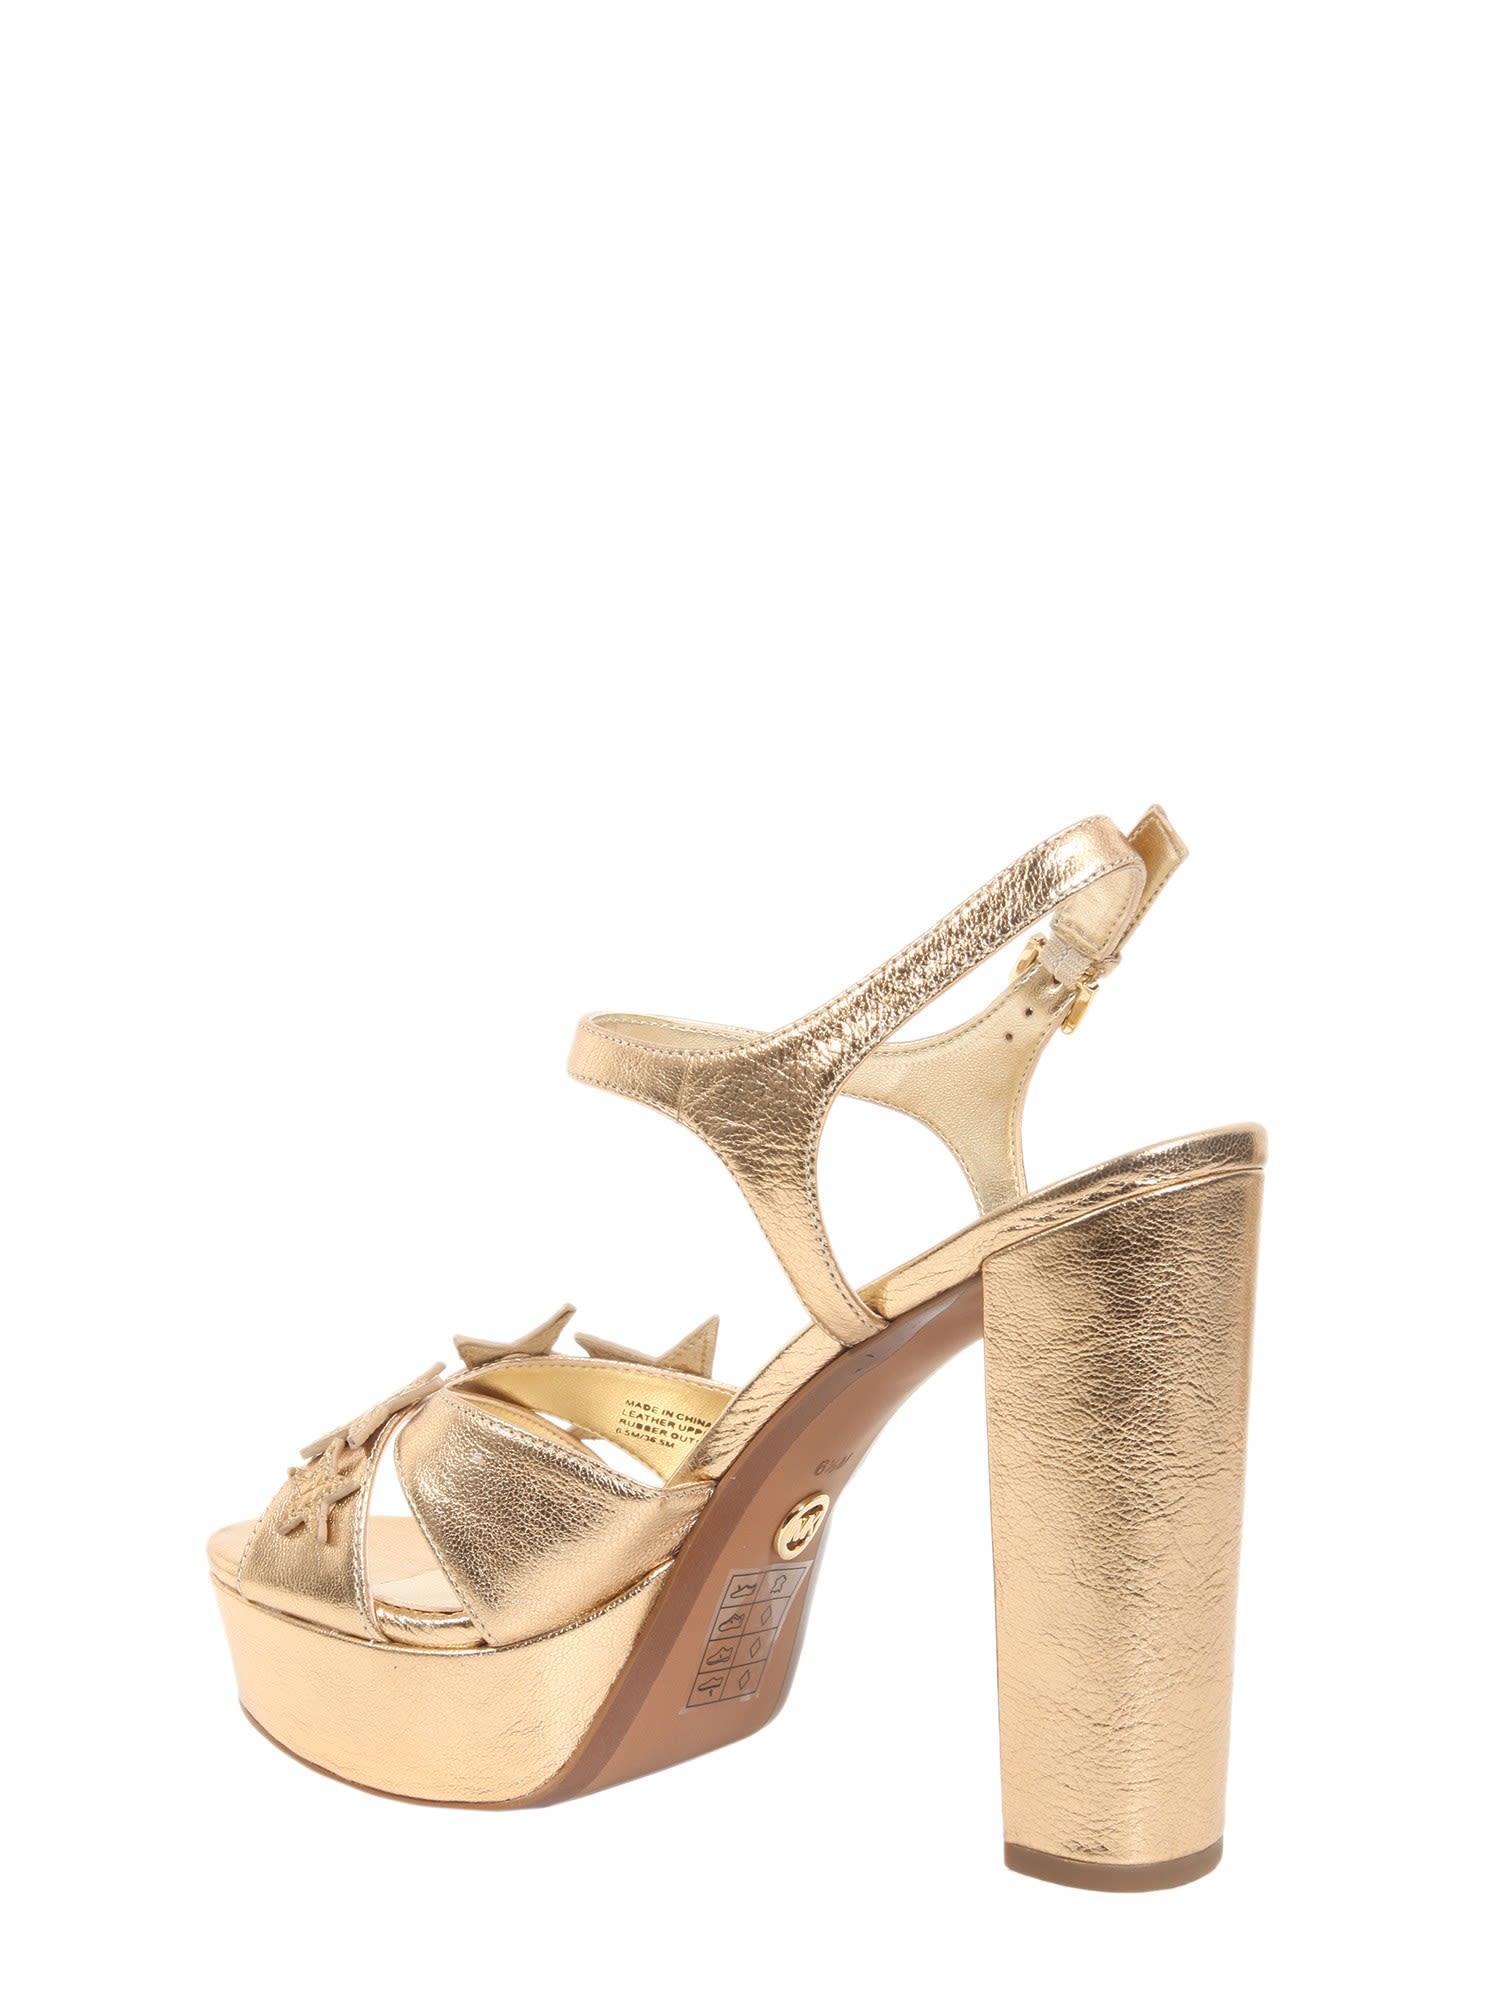 6b4fd8248748 MICHAEL Michael Kors MICHAEL Michael Kors Lexie Platform Sandals ...